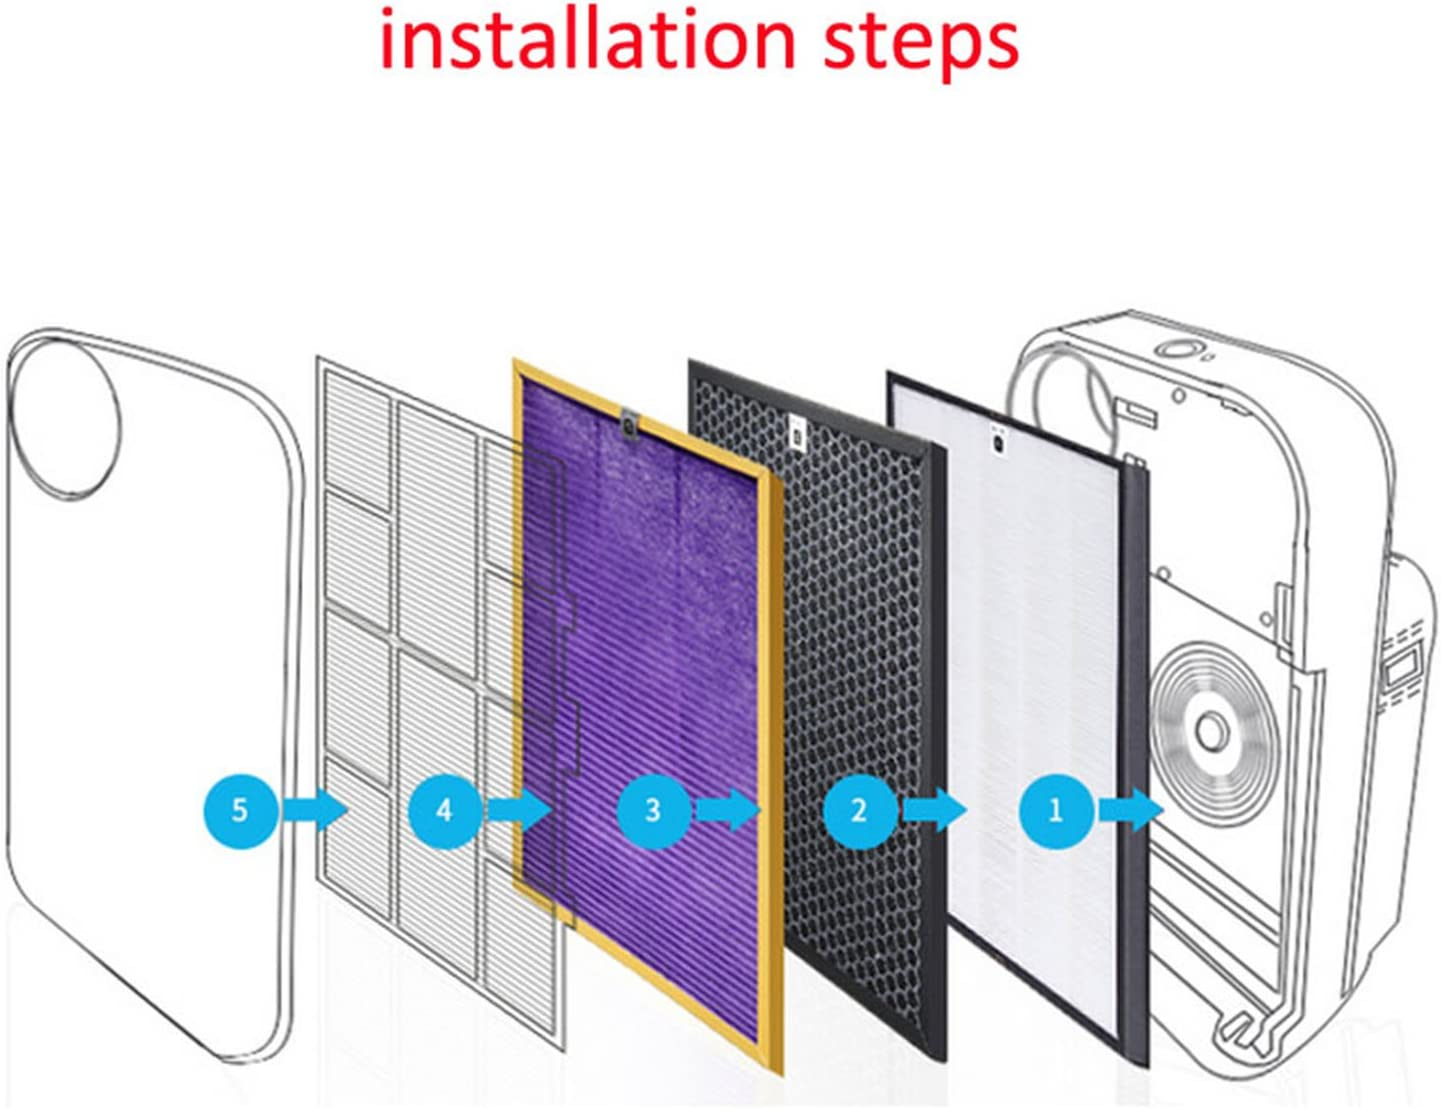 reyee ac4141 + ac4143 + ac4144 Kit de filtro para Philips AC4072 ...